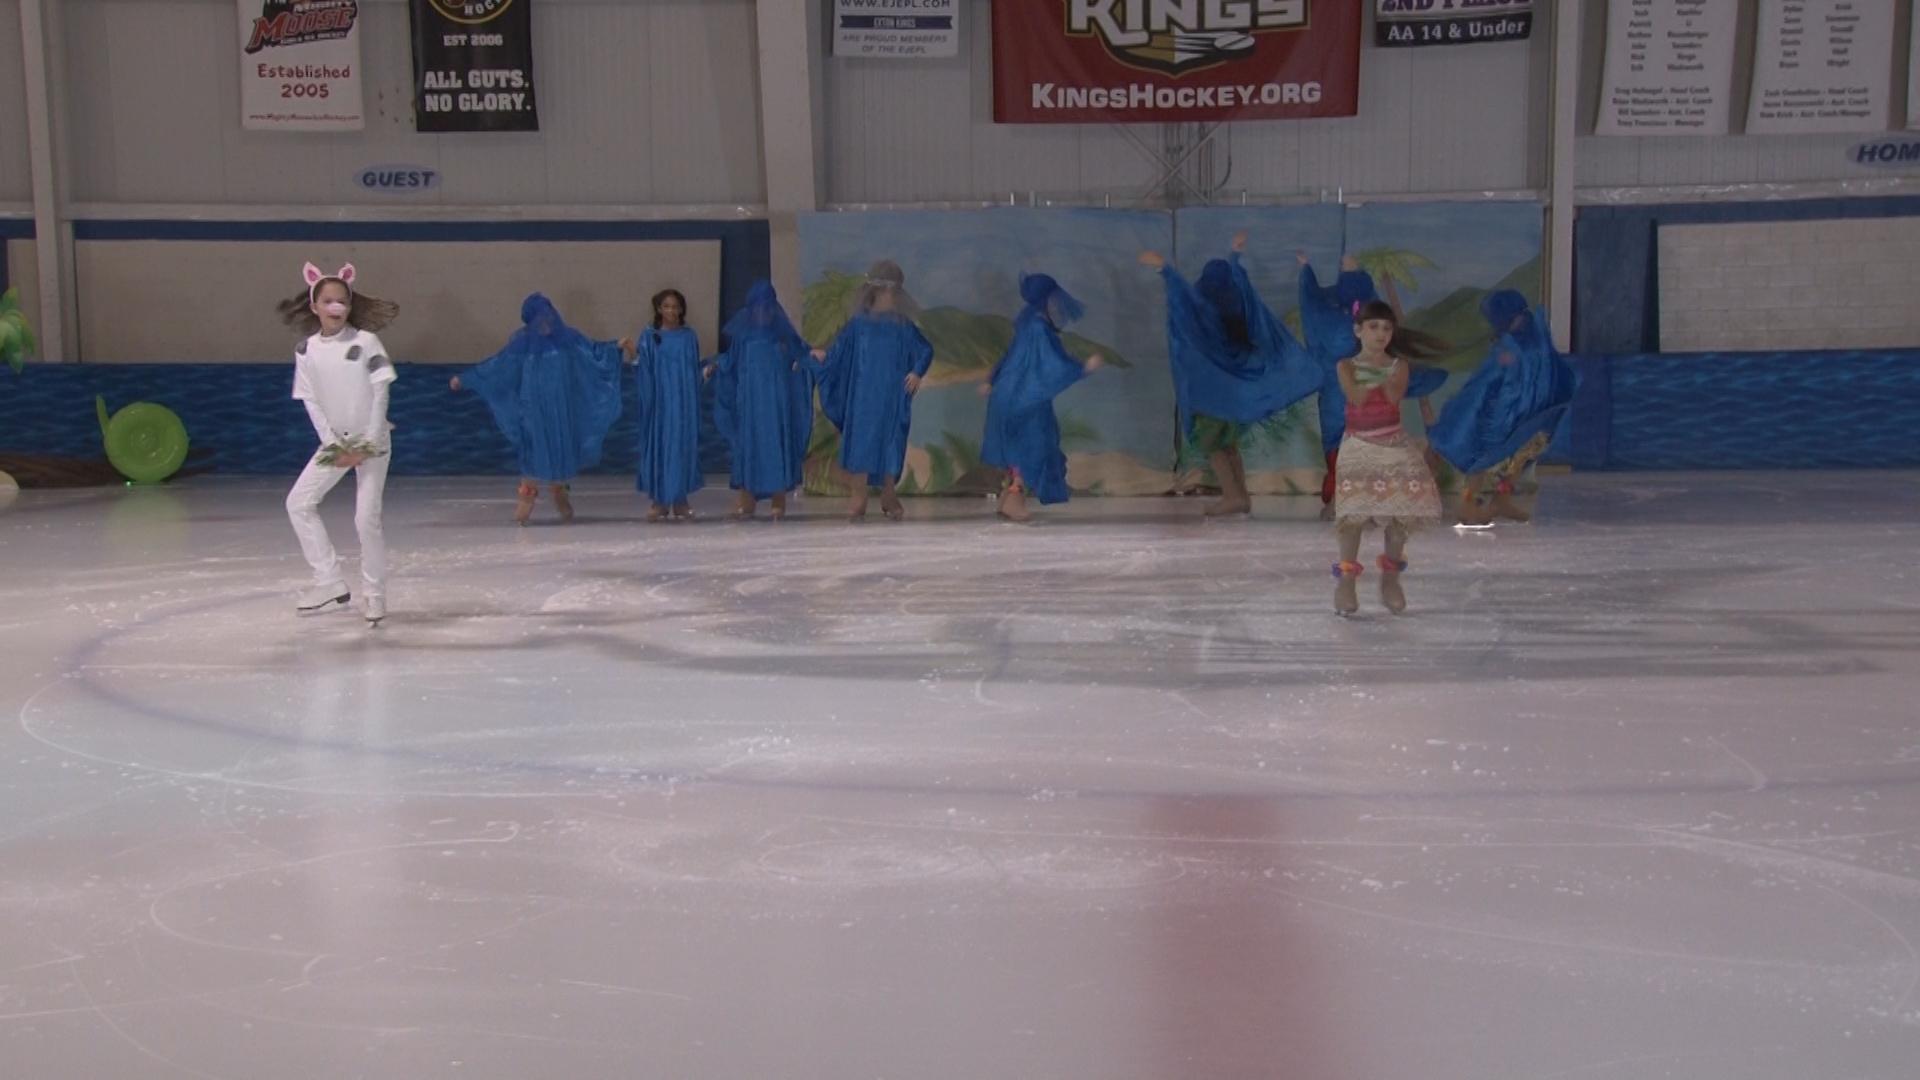 Power Play Maui Skate on Ice 071417.00_03_43_23.Still002.jpg